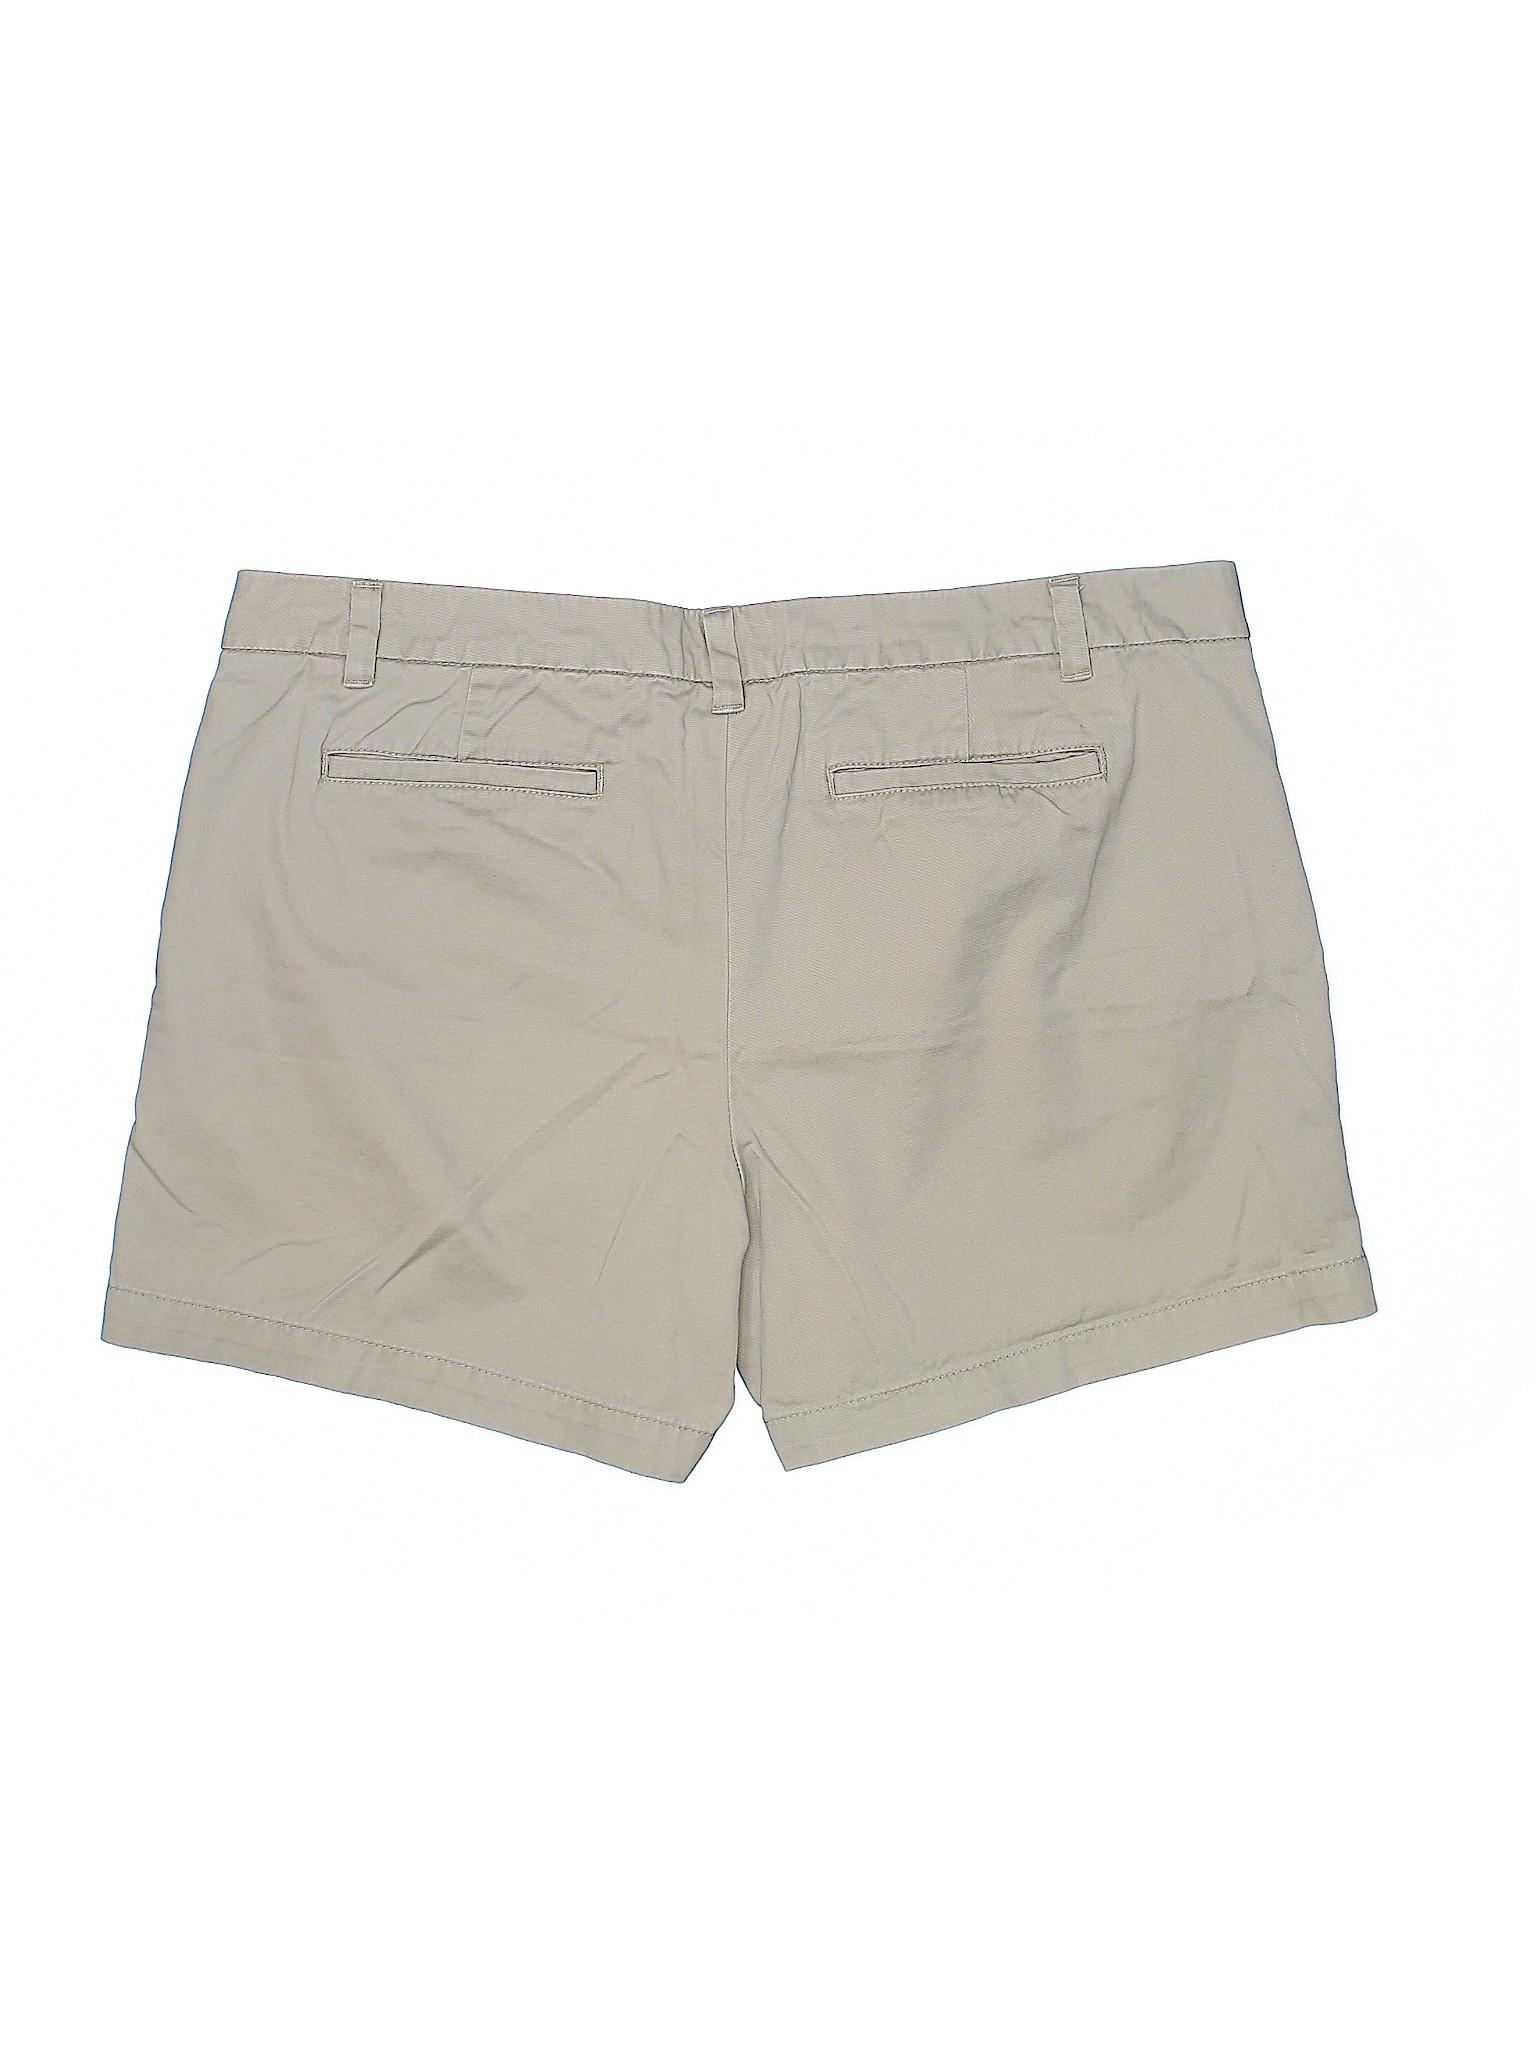 Shorts Boutique Boutique Merona Khaki Khaki Merona nXdrSXxw